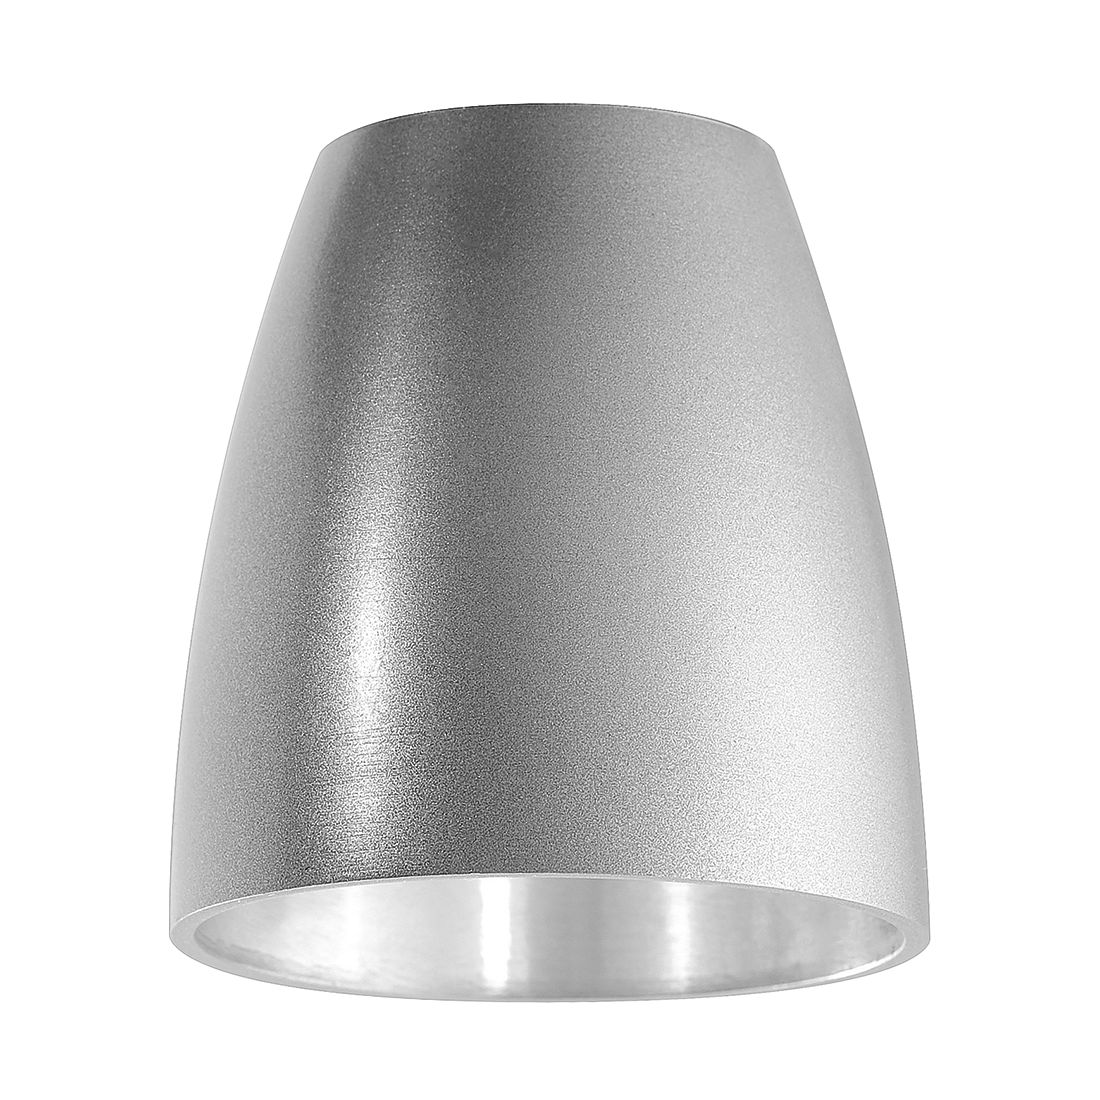 Image of Paralume metallico - Accessorio M6 luce/faretto 18 Metallo Color argento, Fischer Leuchten